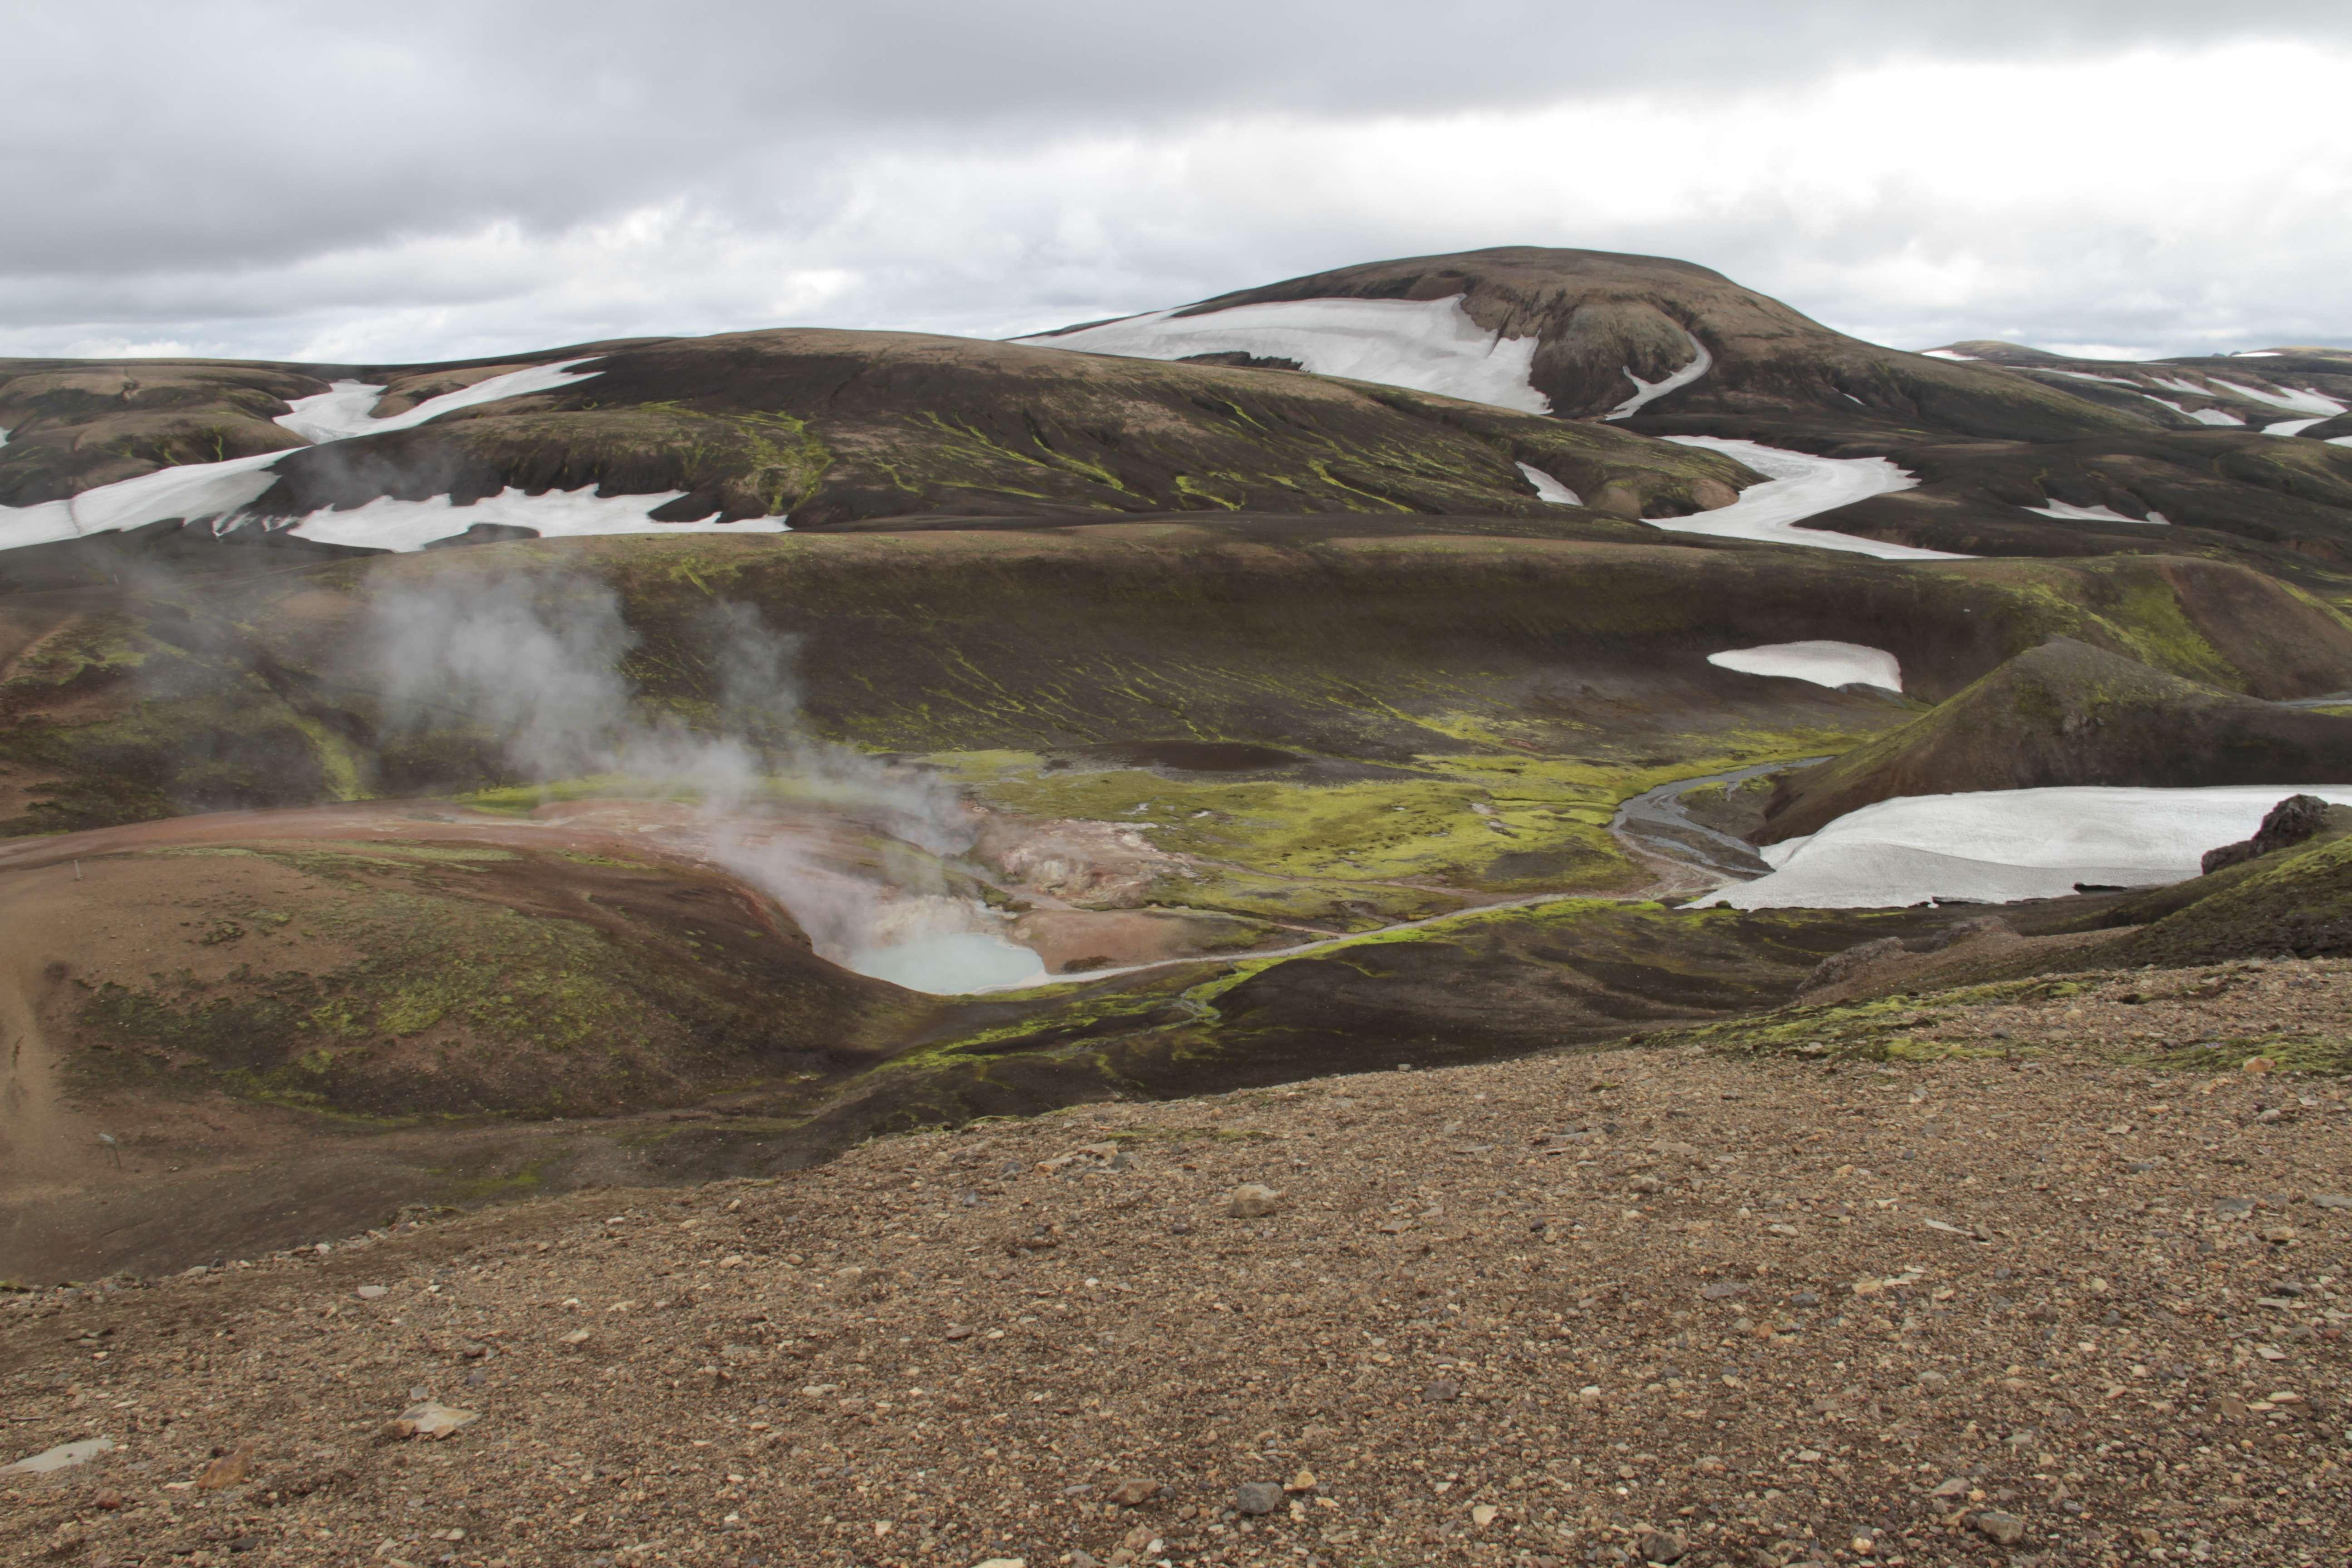 Islande_0533 trail jour 1 Landmanalaugar-Alftavatn 17 juillet